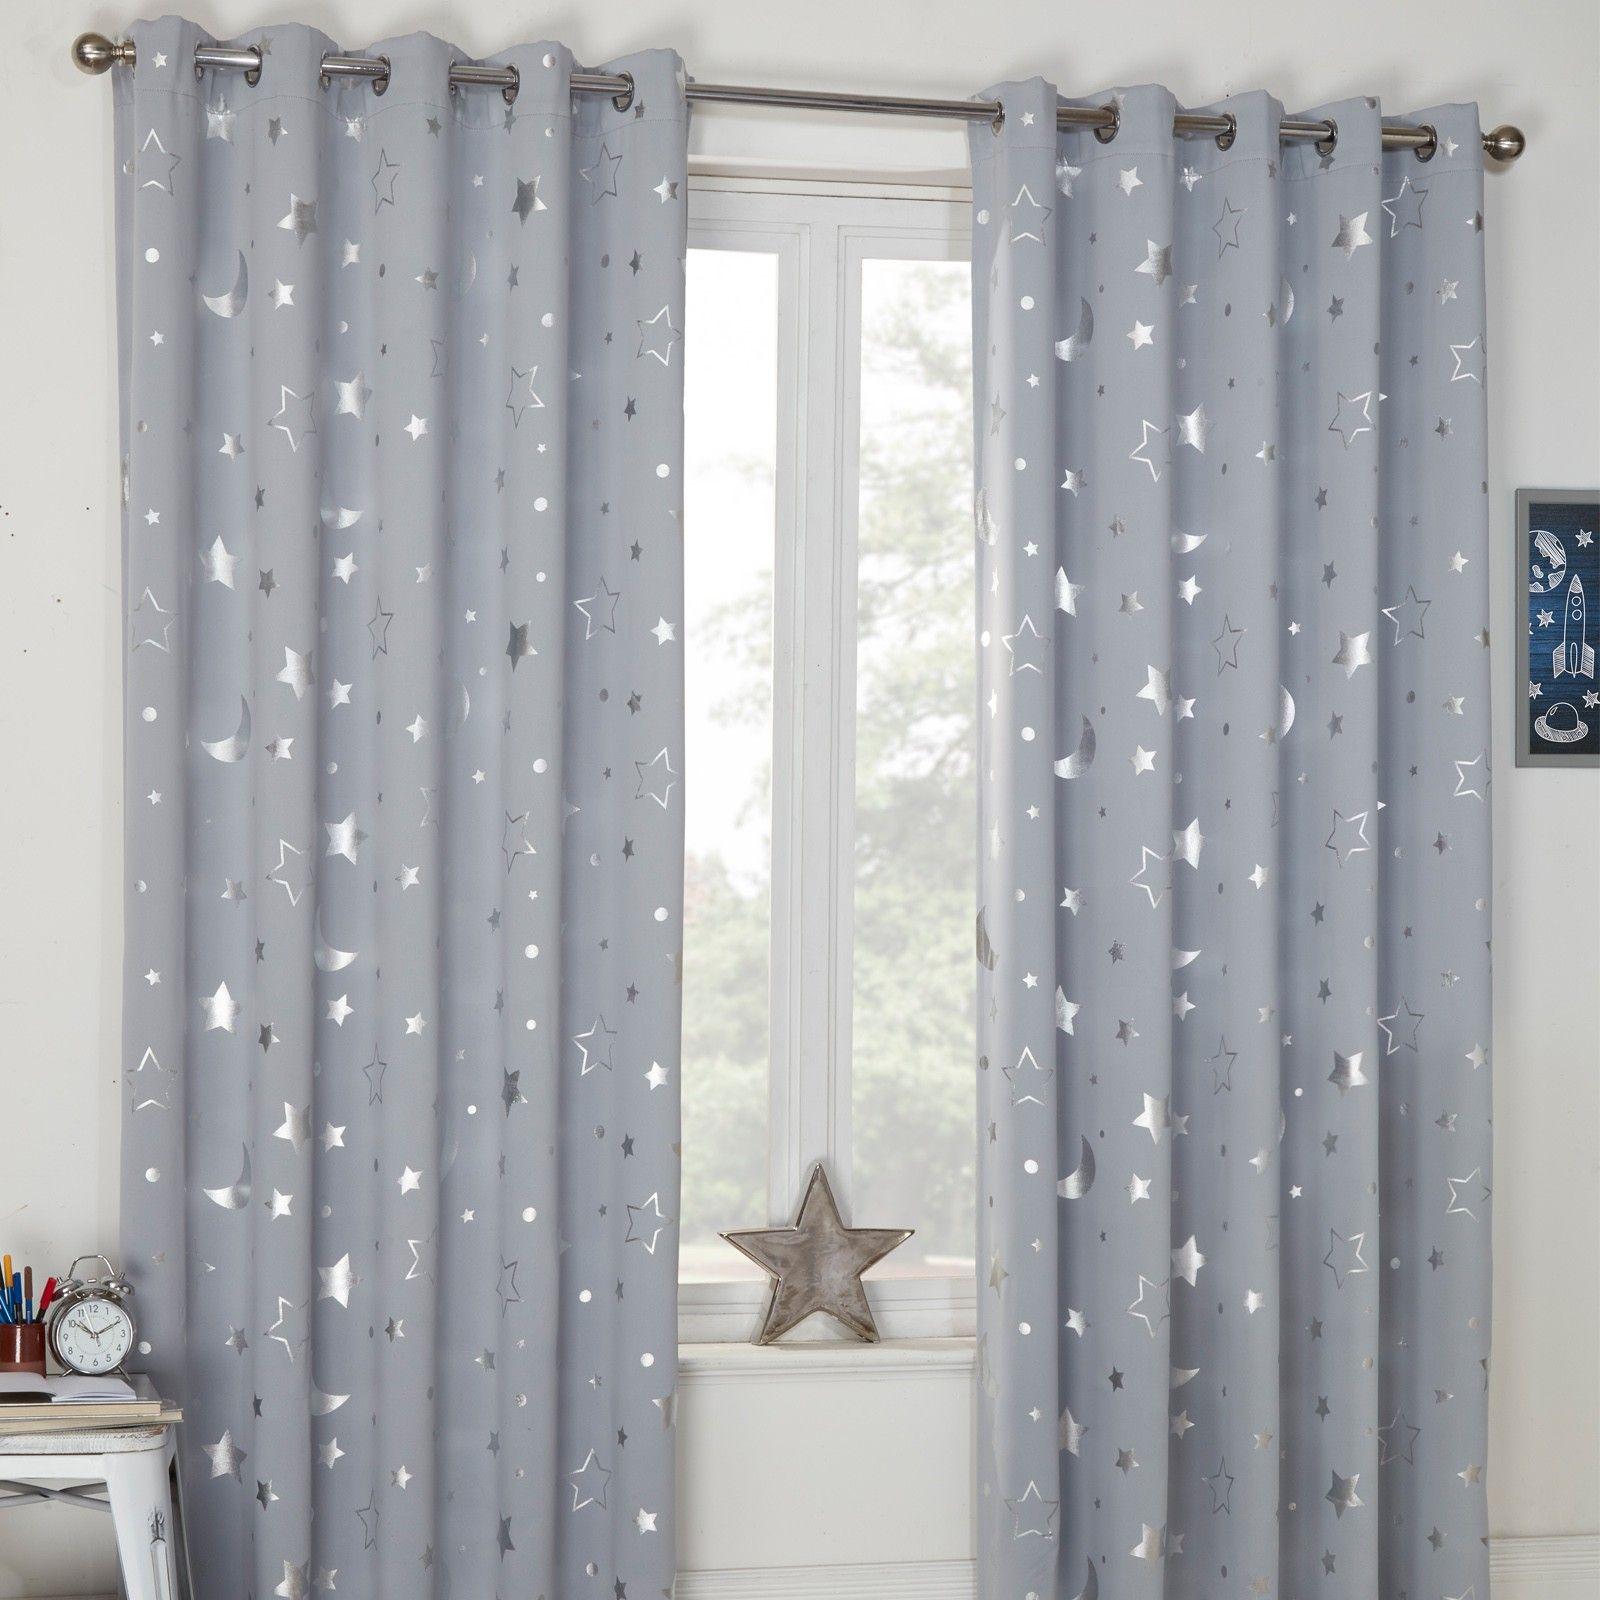 Dreamscene Star Blackout Galaxy Kids Curtains Silver Grey Kids Curtains Thermal Curtains Curtains Ready Made